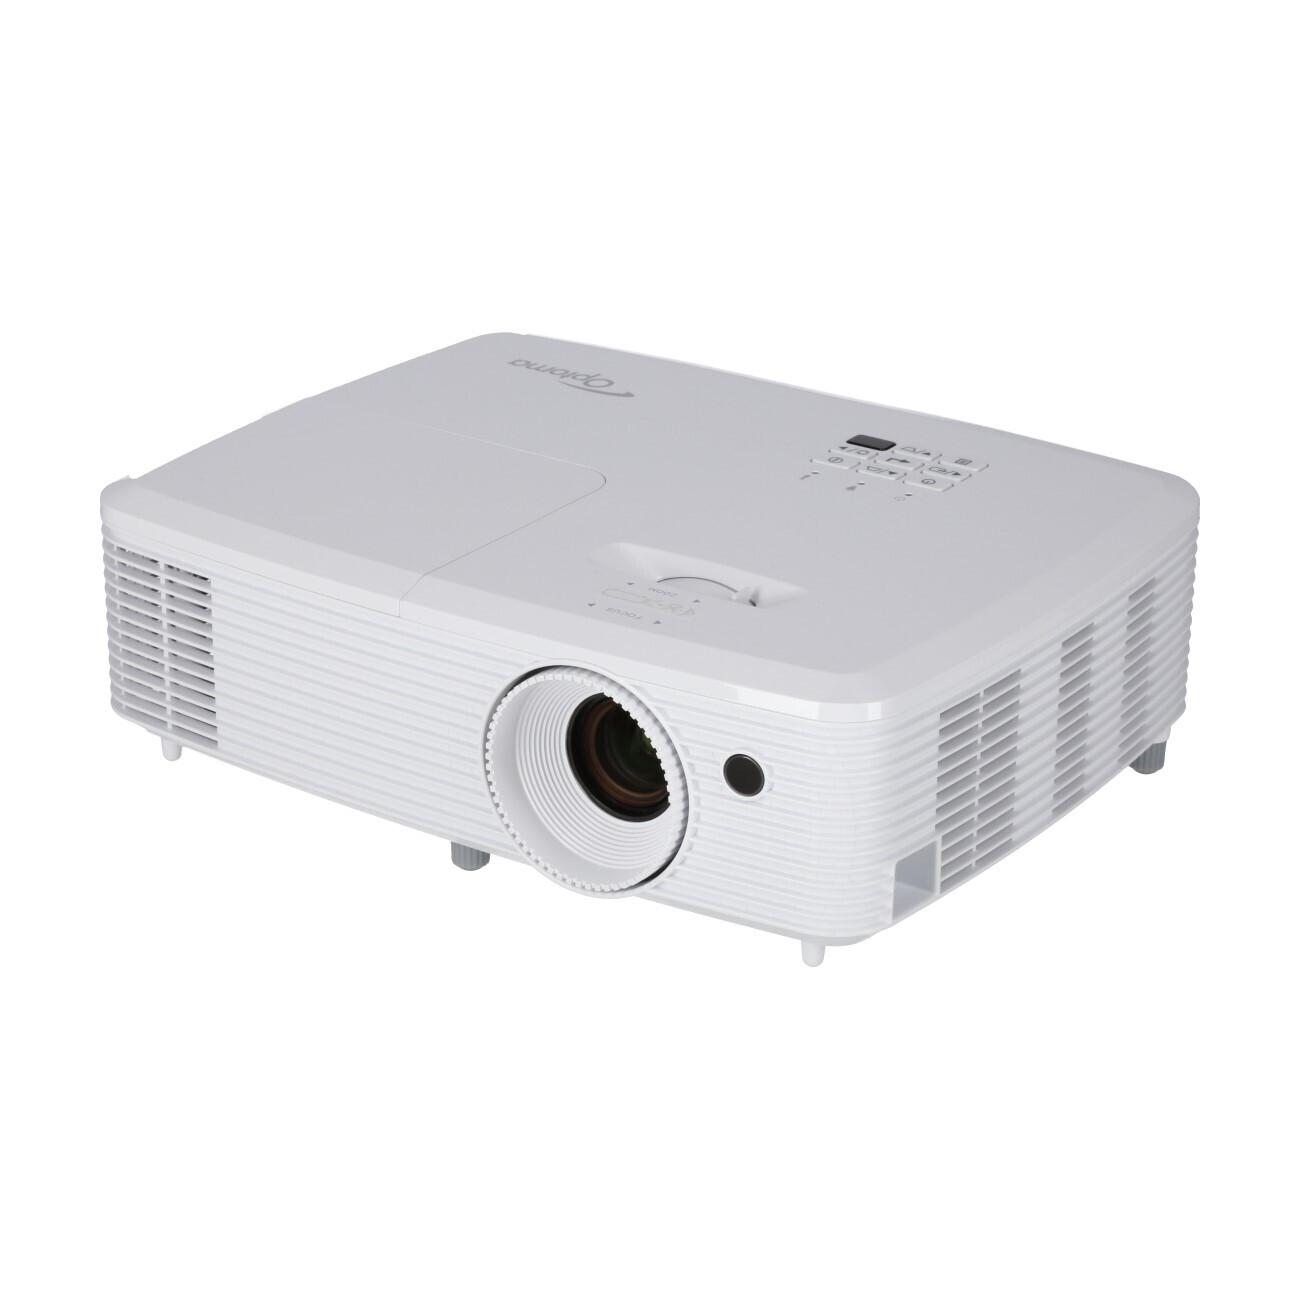 Optoma HD29Darbee 3D Heimkino Beamer mit 3200 ANSI-Lumen und Full-HD